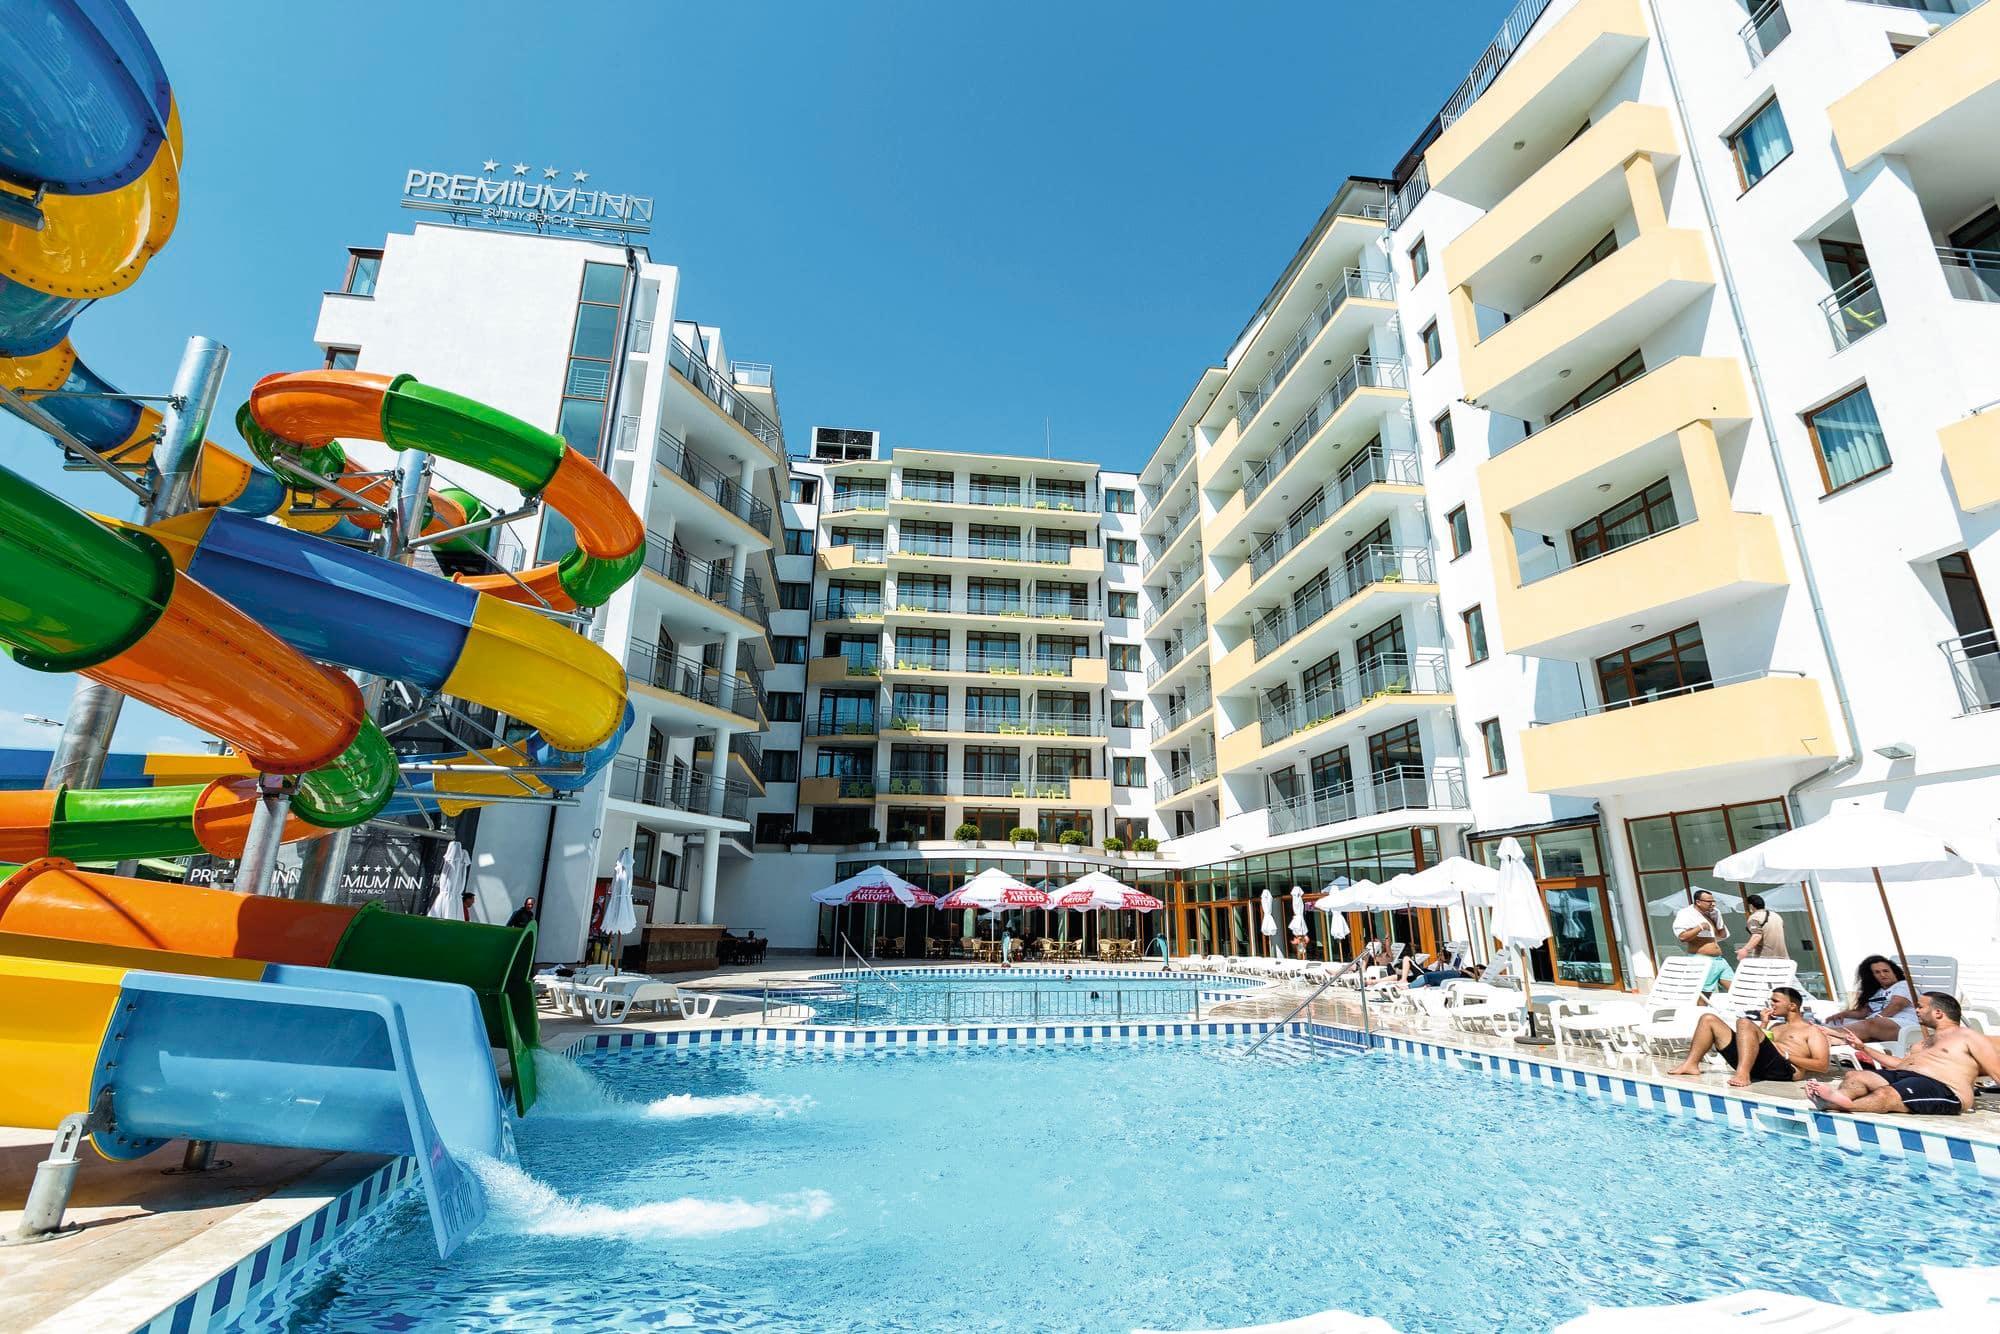 Best Western Plus Premium Inn Hotel And Casino